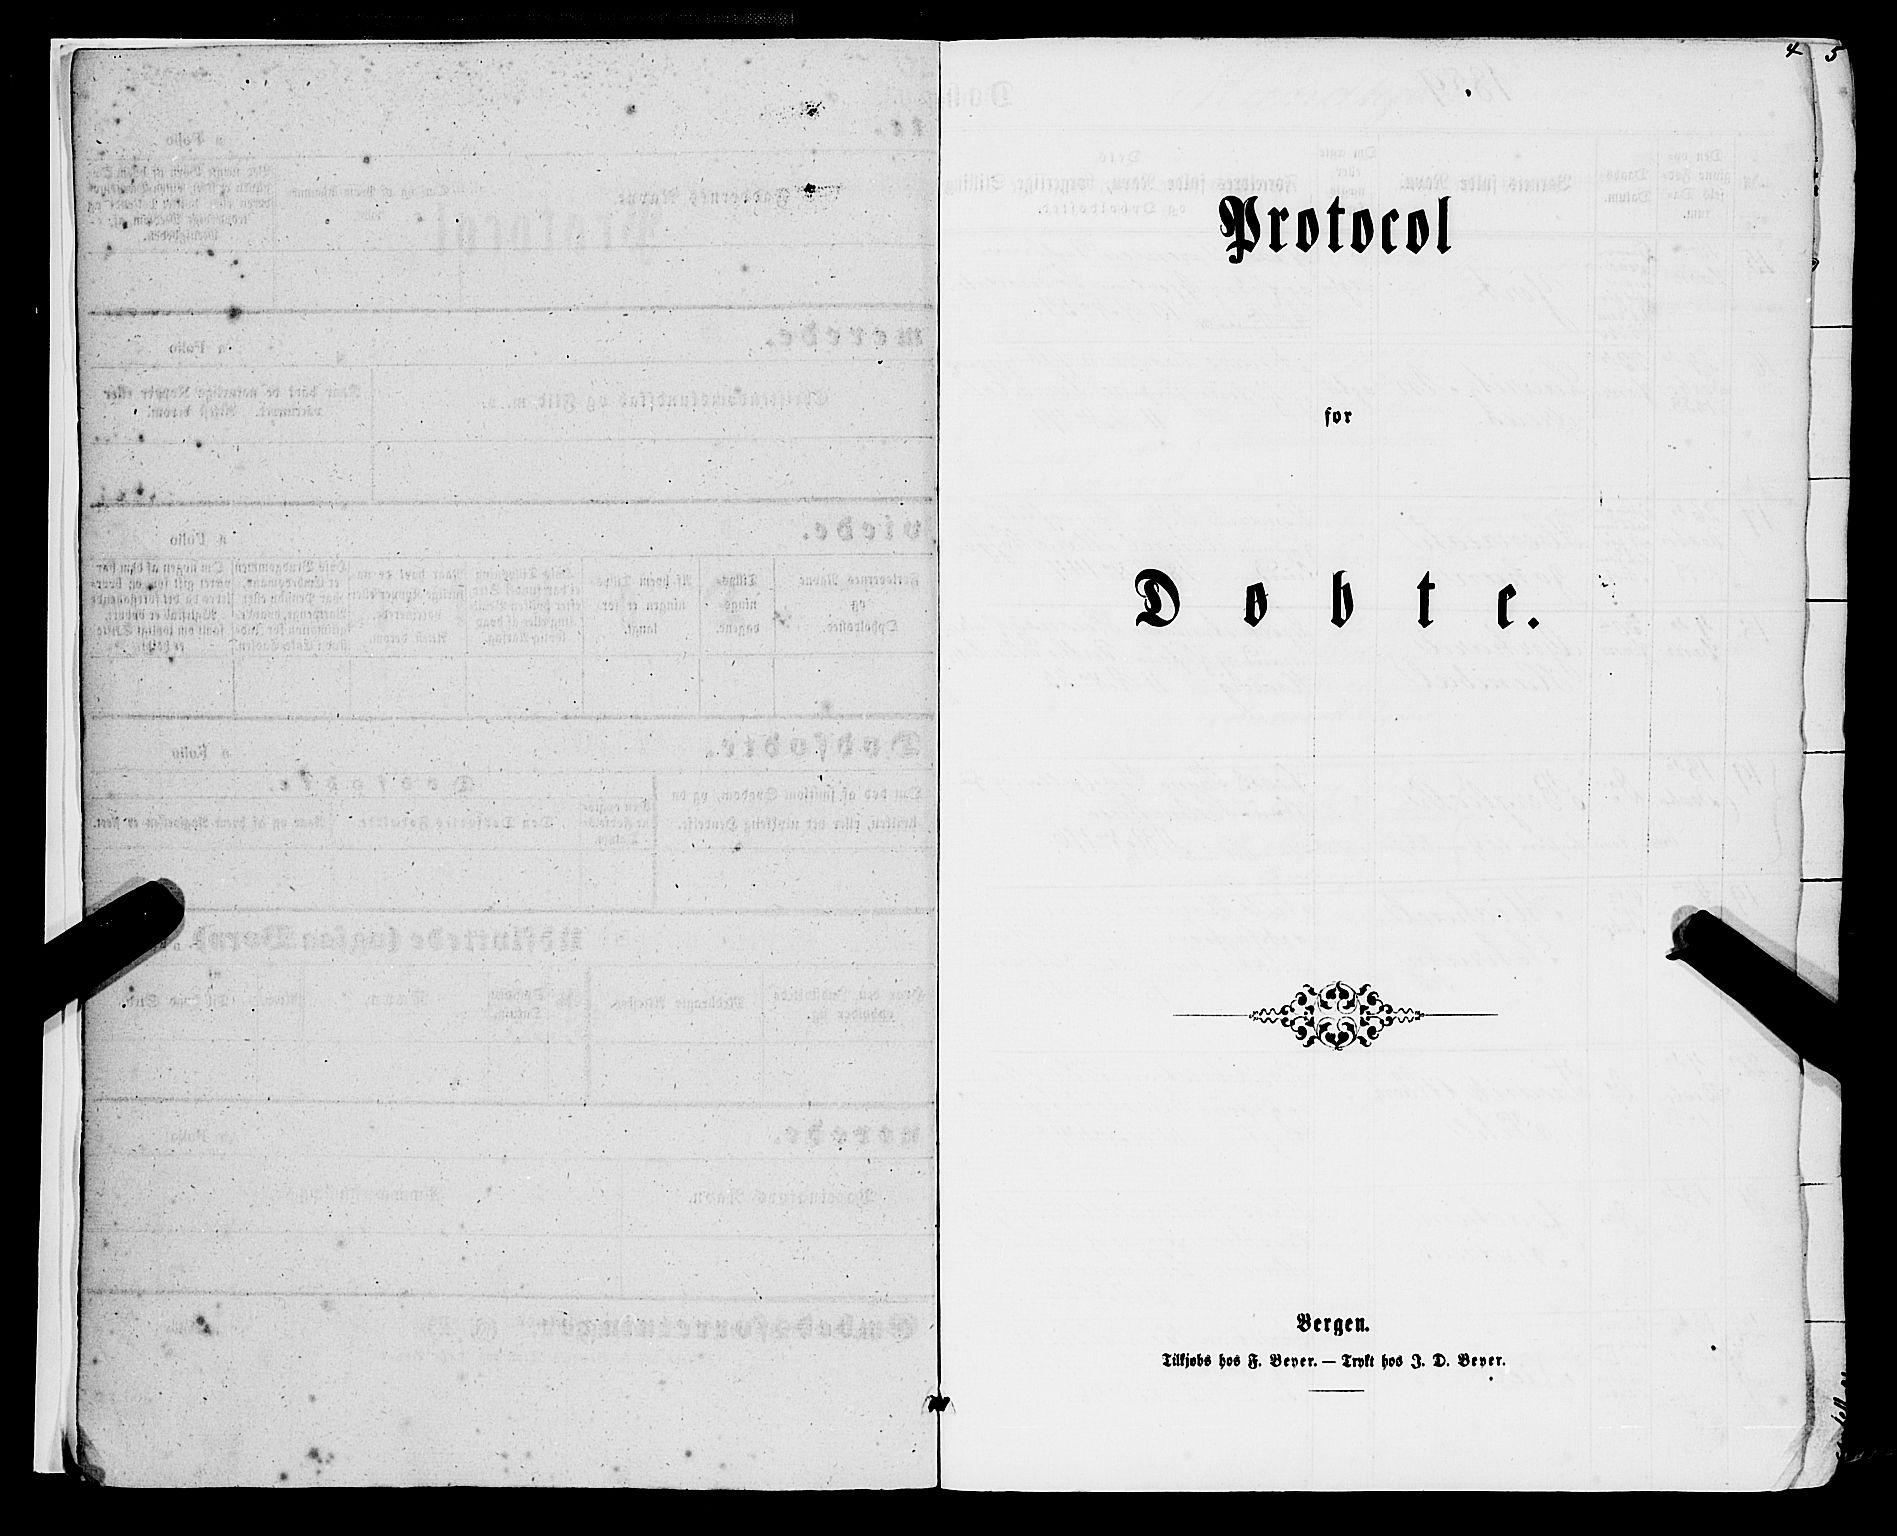 SAB, Domkirken Sokneprestembete, H/Haa/L0021: Ministerialbok nr. B 4, 1859-1871, s. 4